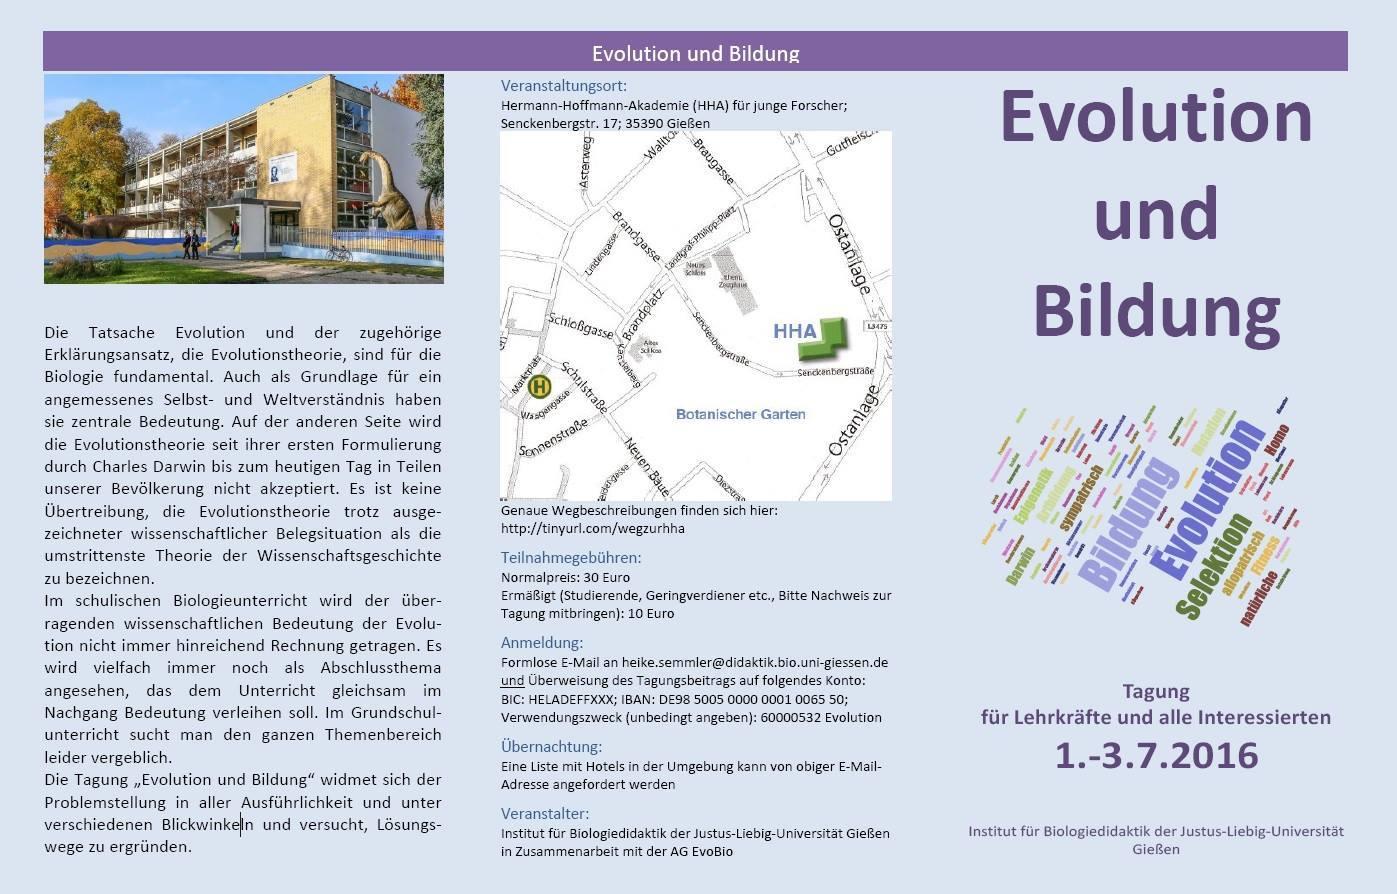 EvolutionundBildungGiessen0716